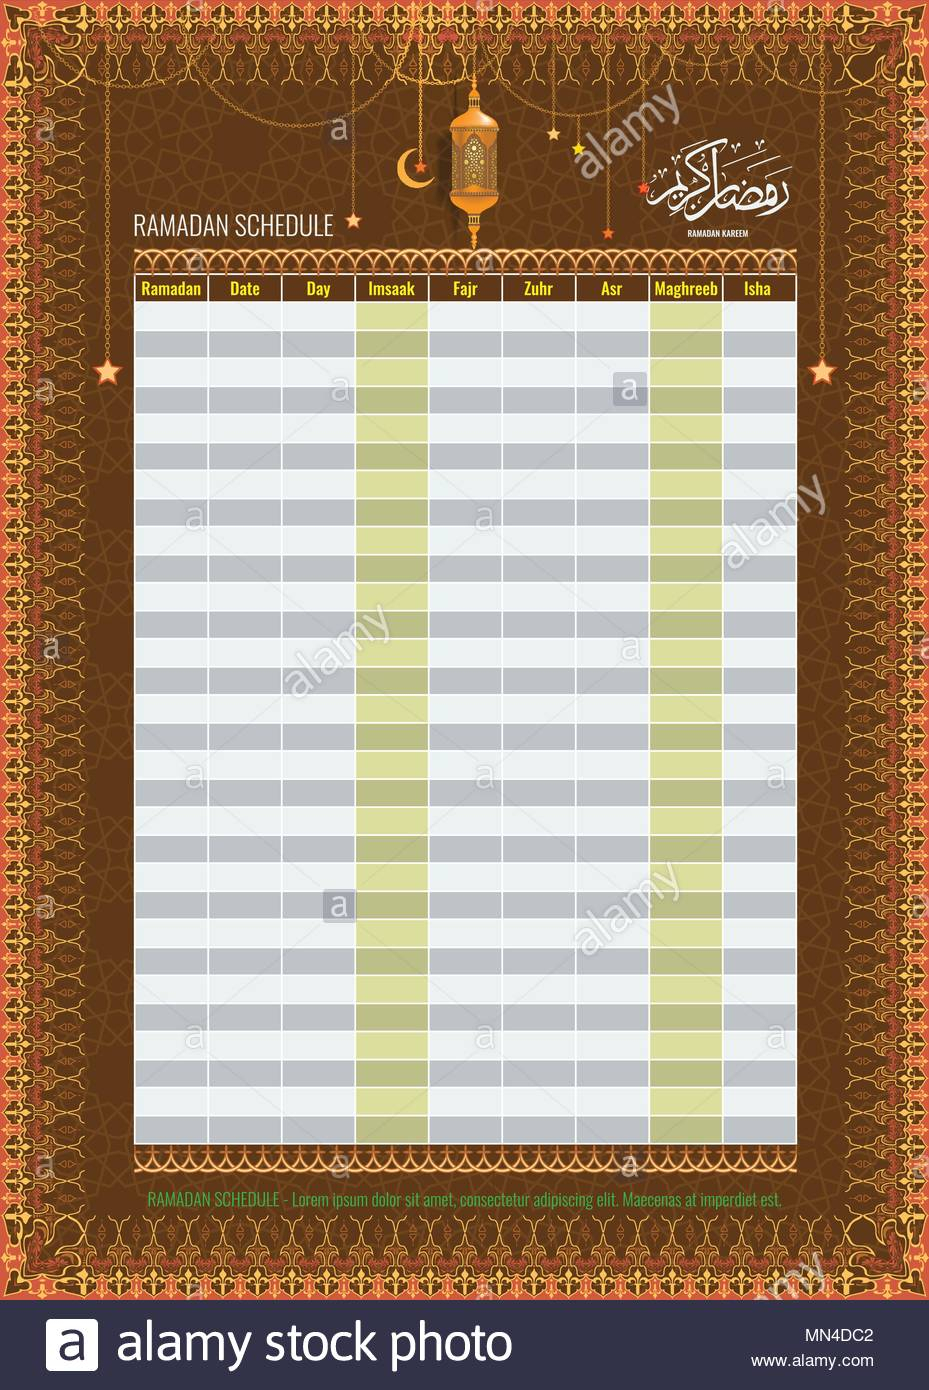 Arabic Calendar Stock Photos & Arabic Calendar Stock Images within Isha Lunar Calendar 2020